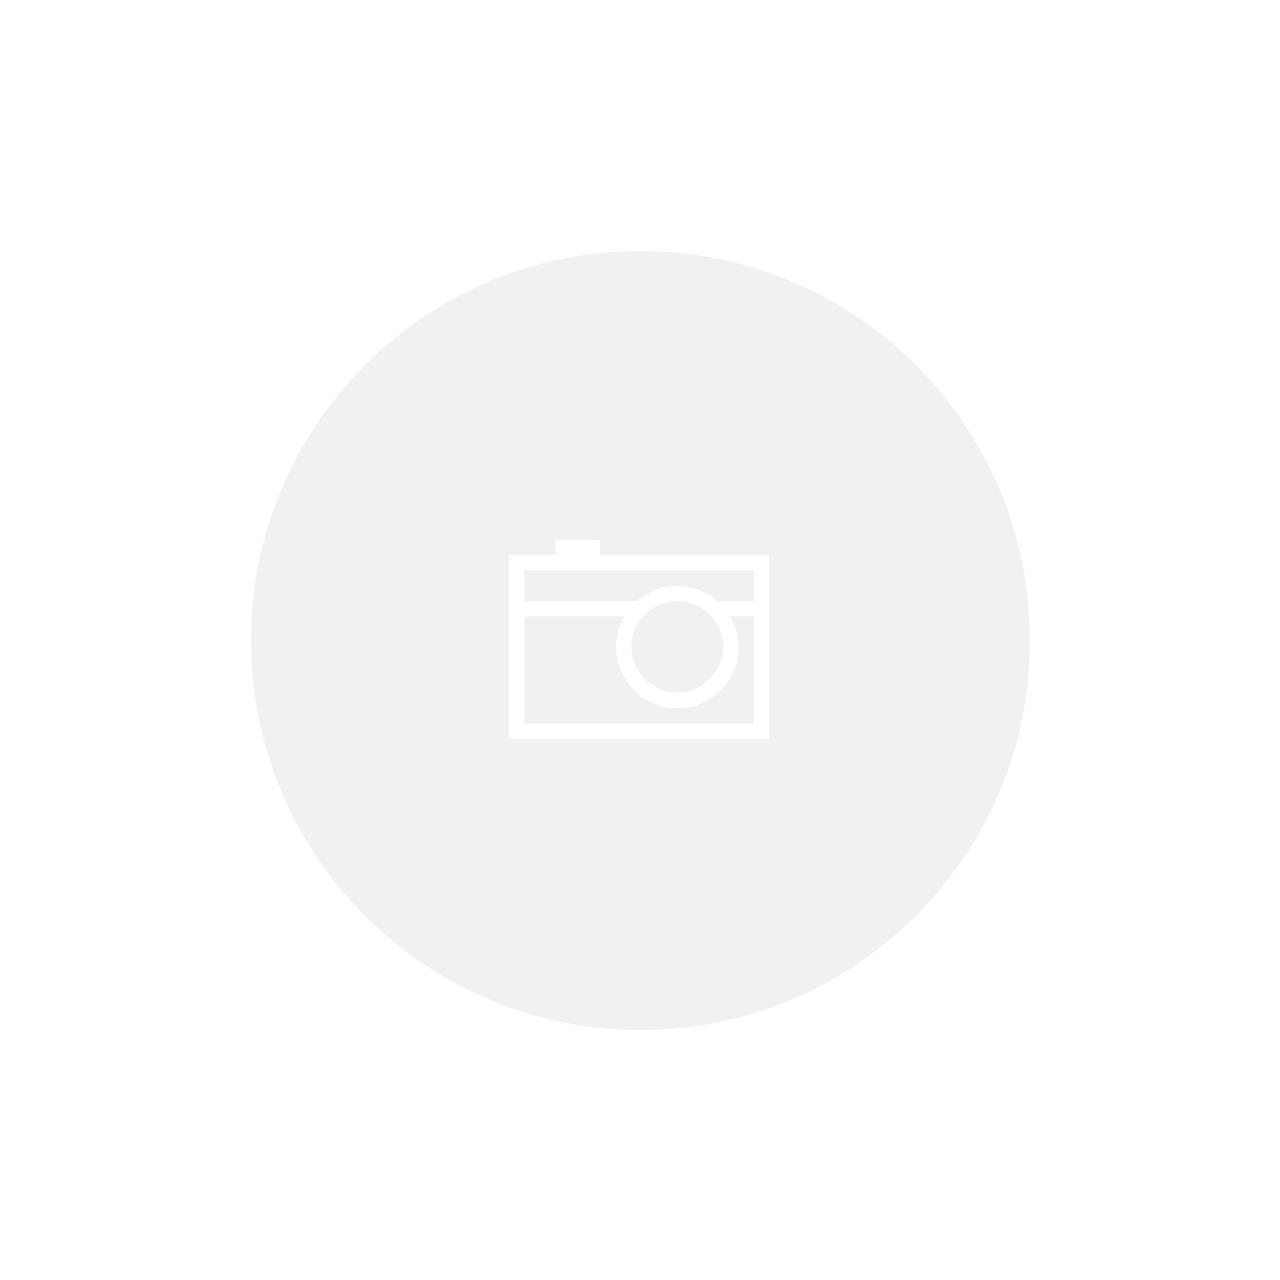 Vestido Ombro a Ombro Tricô Tranças   Vi026